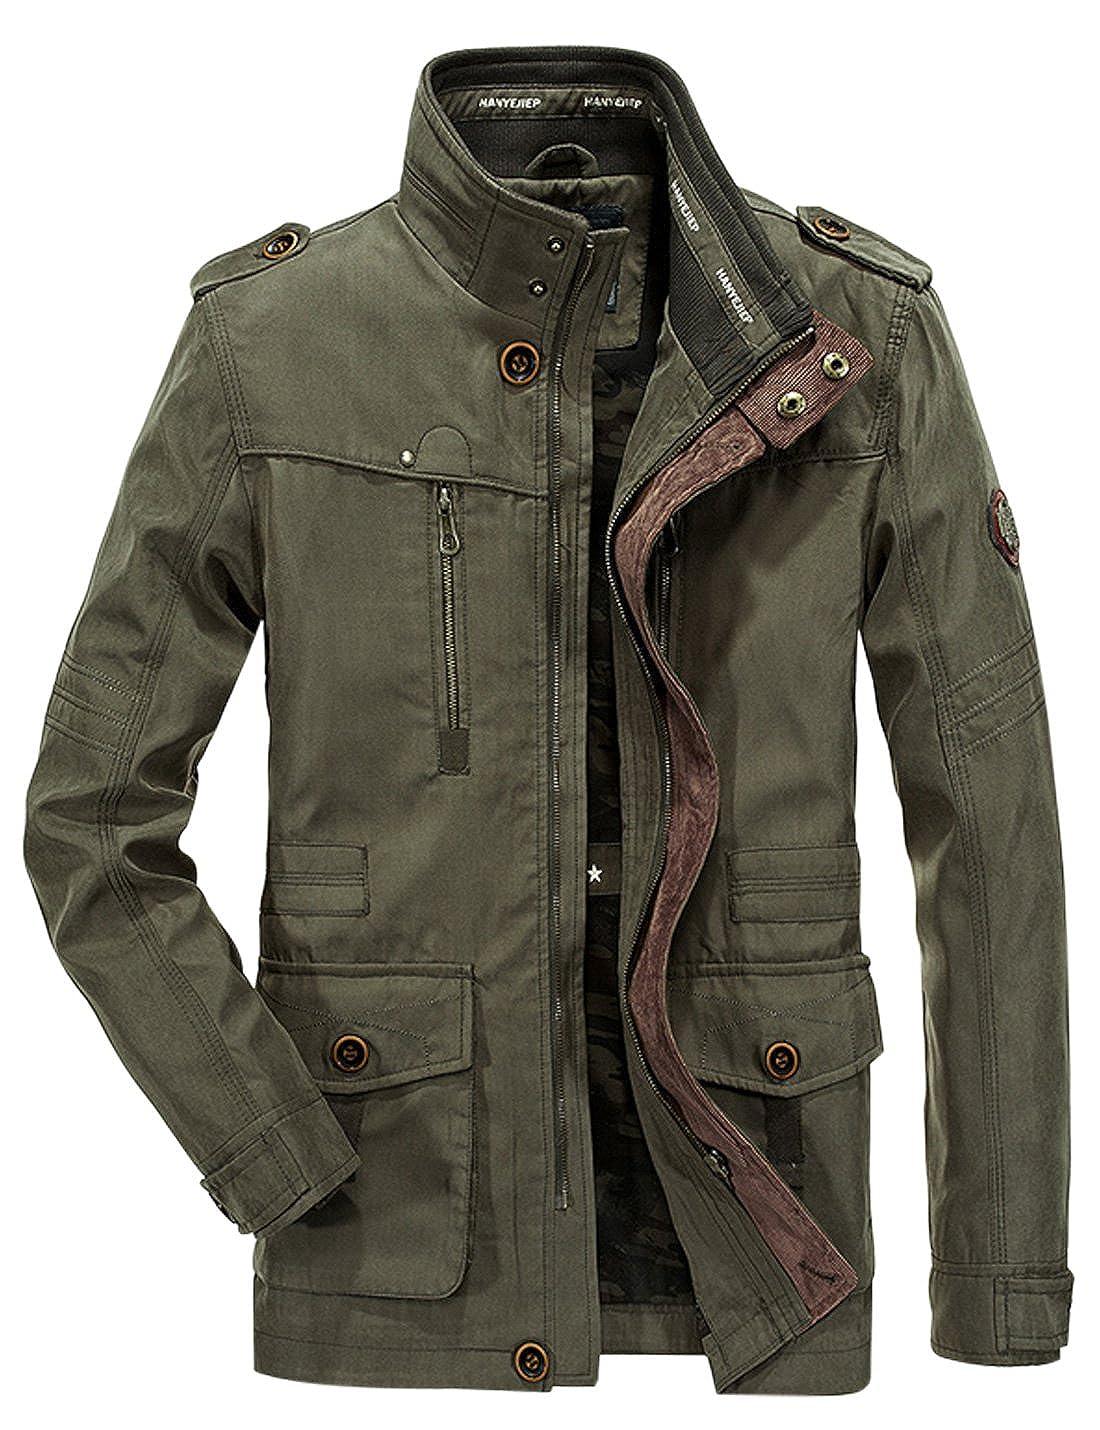 Jenkoon Men s Casul Stand Collar Jacket Lightweight Military Windbreaker  Coat at Amazon Men s Clothing store  1f89a8f3d